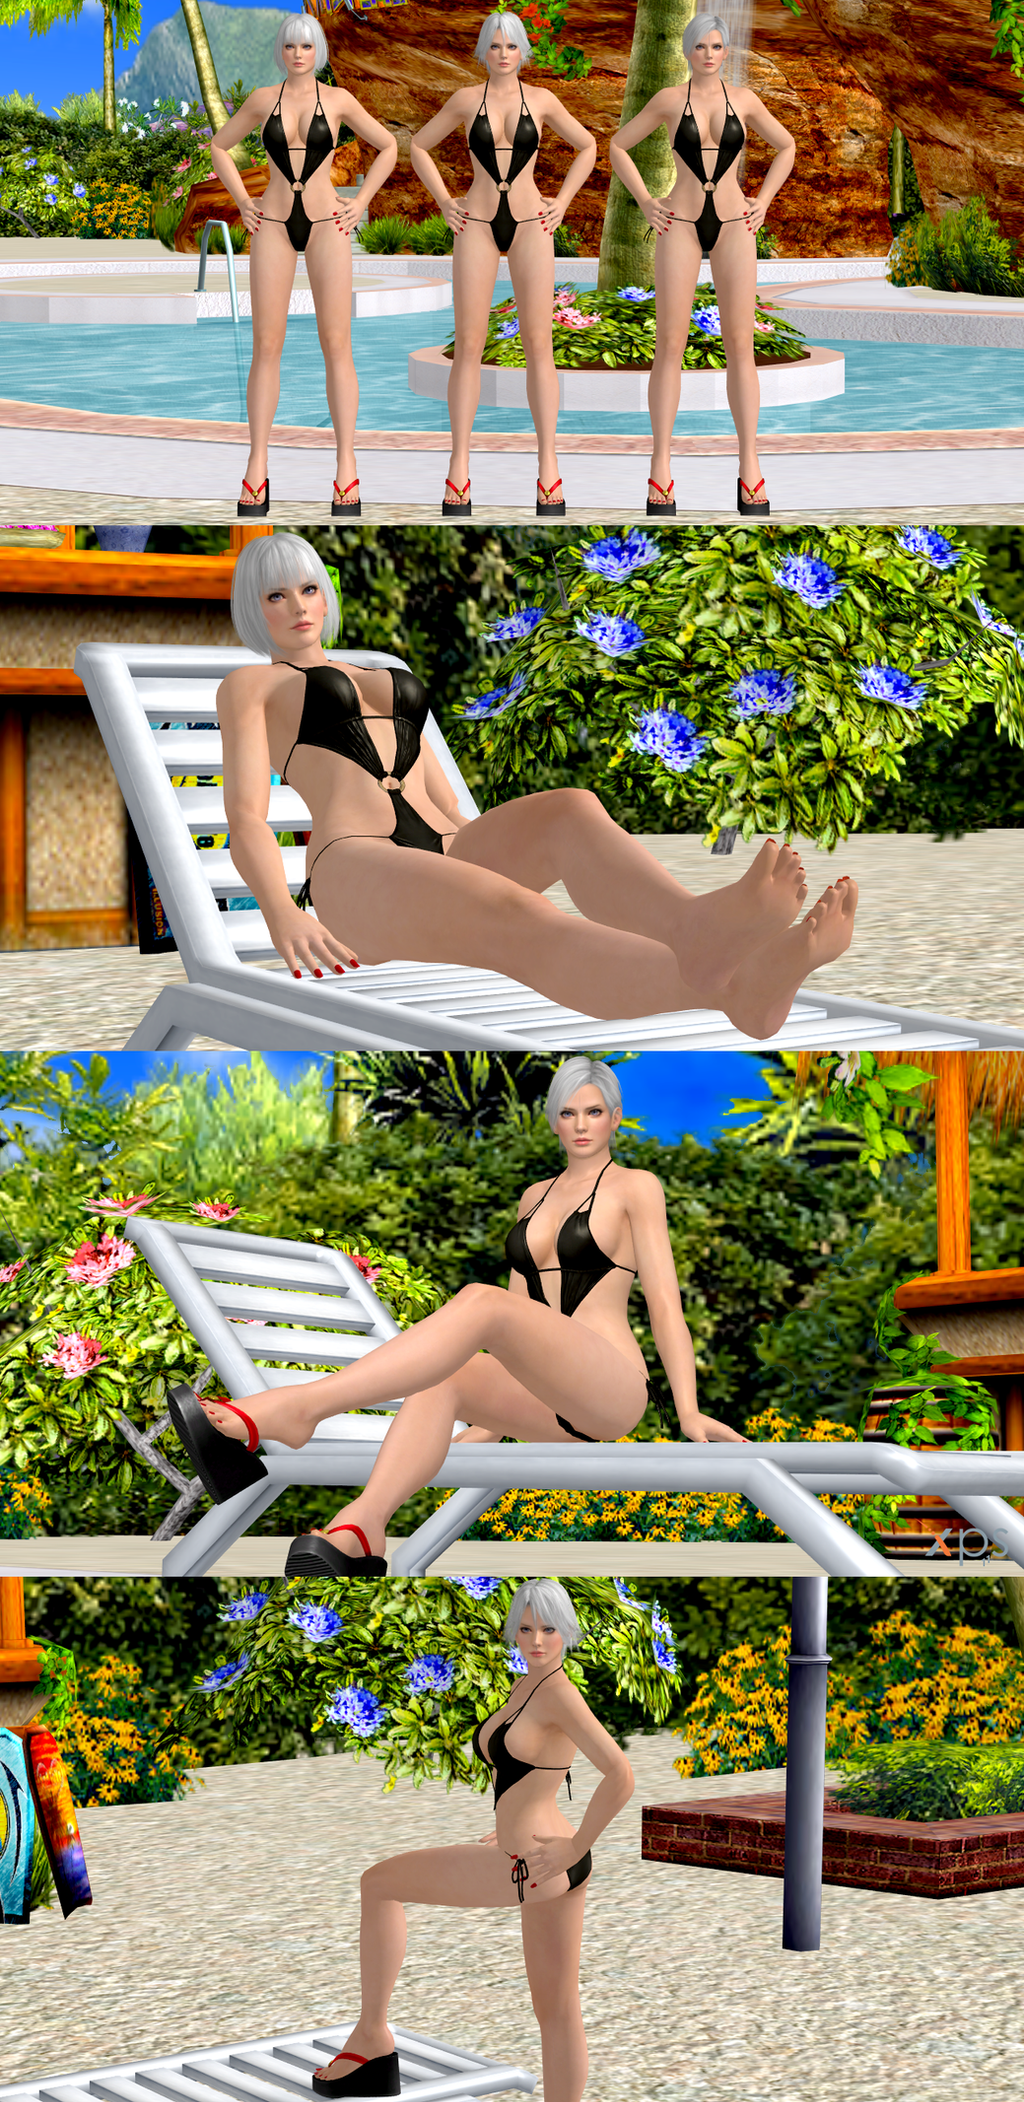 christie_last_getaway_mod_by_redbaron7-db1iufx.png